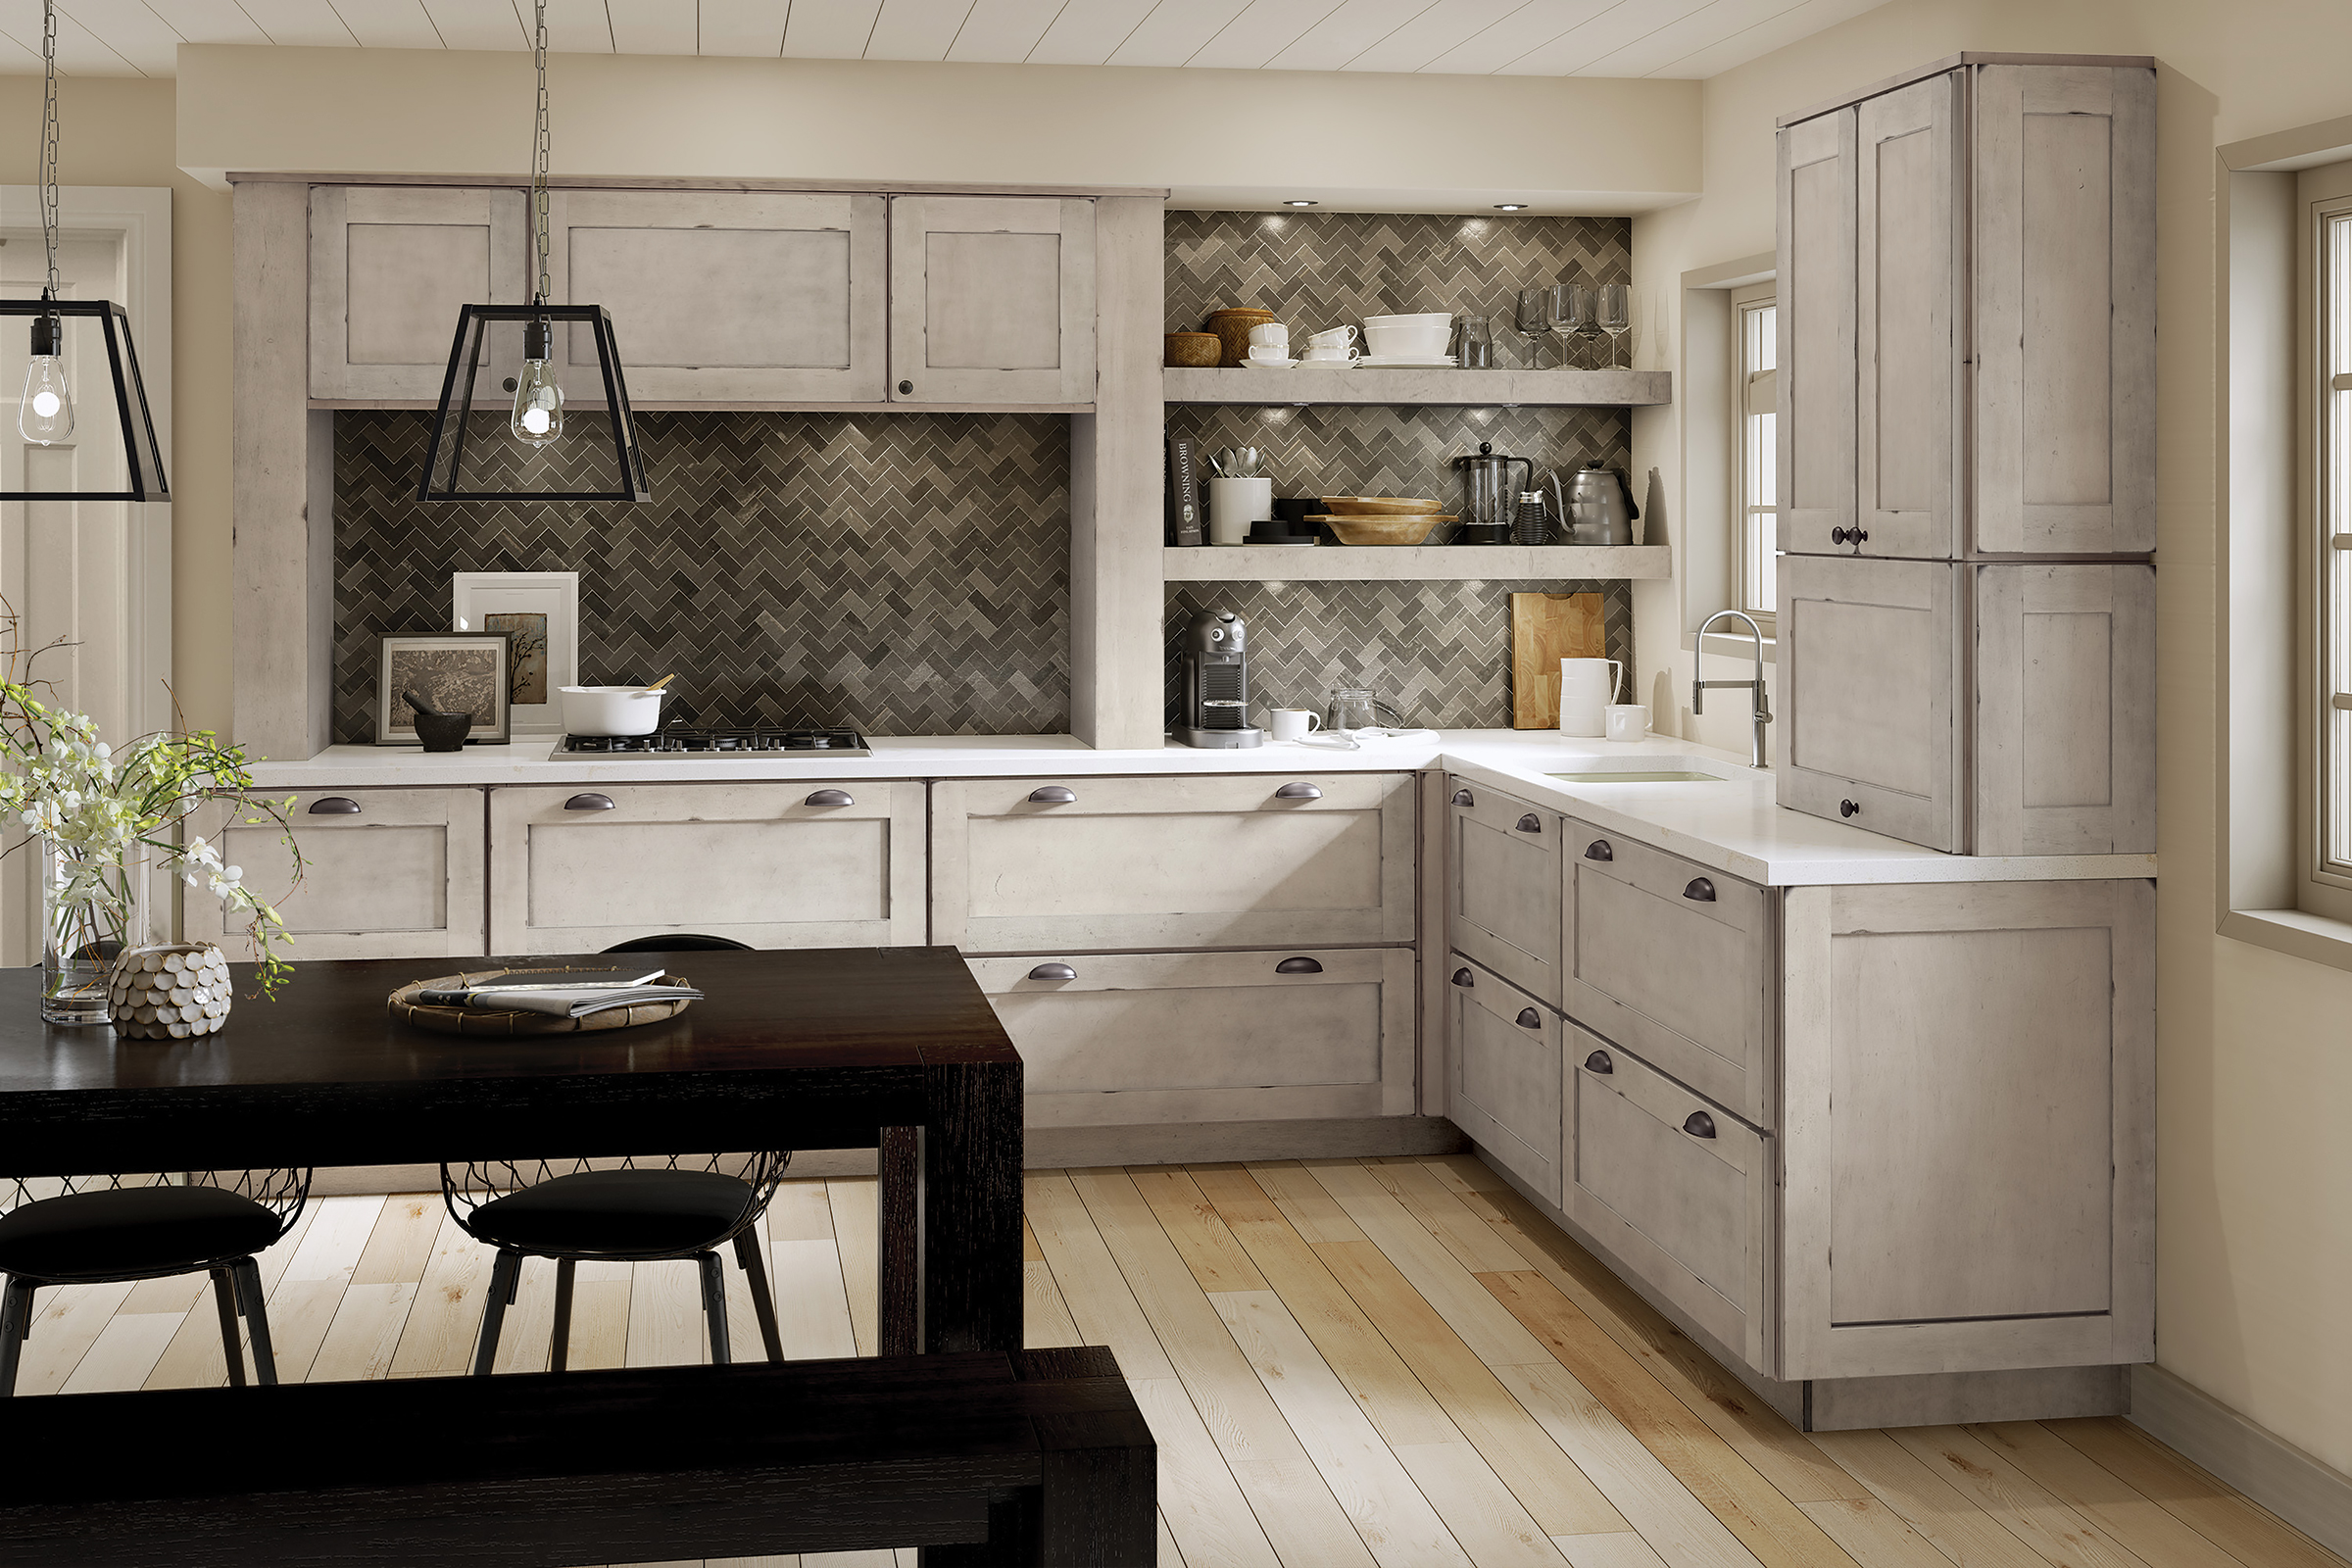 How To Pick The Perfect Kitchen Backsplash Tile Kraftmaid